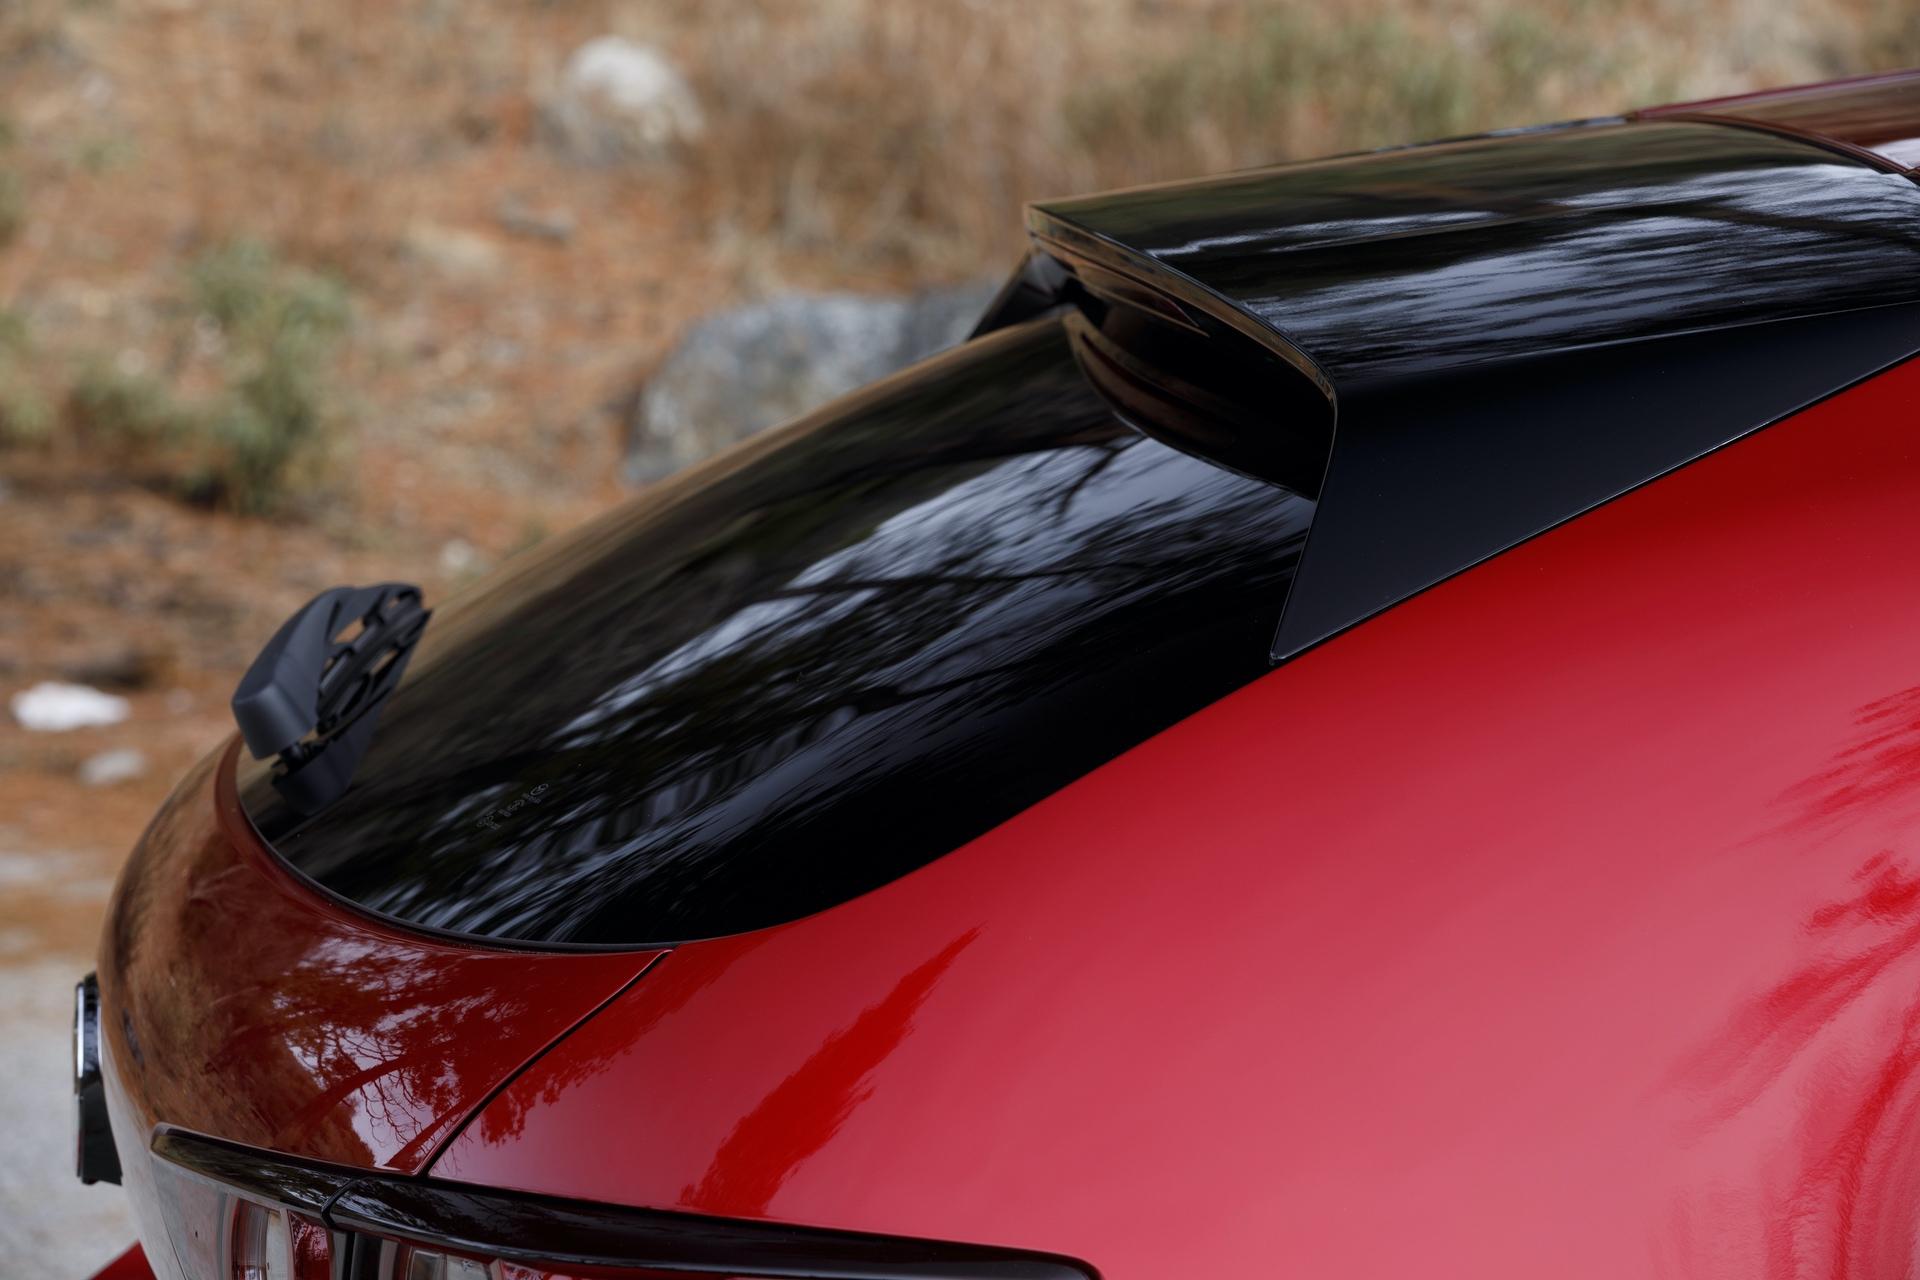 2019-Mazda3-Hatchback_27